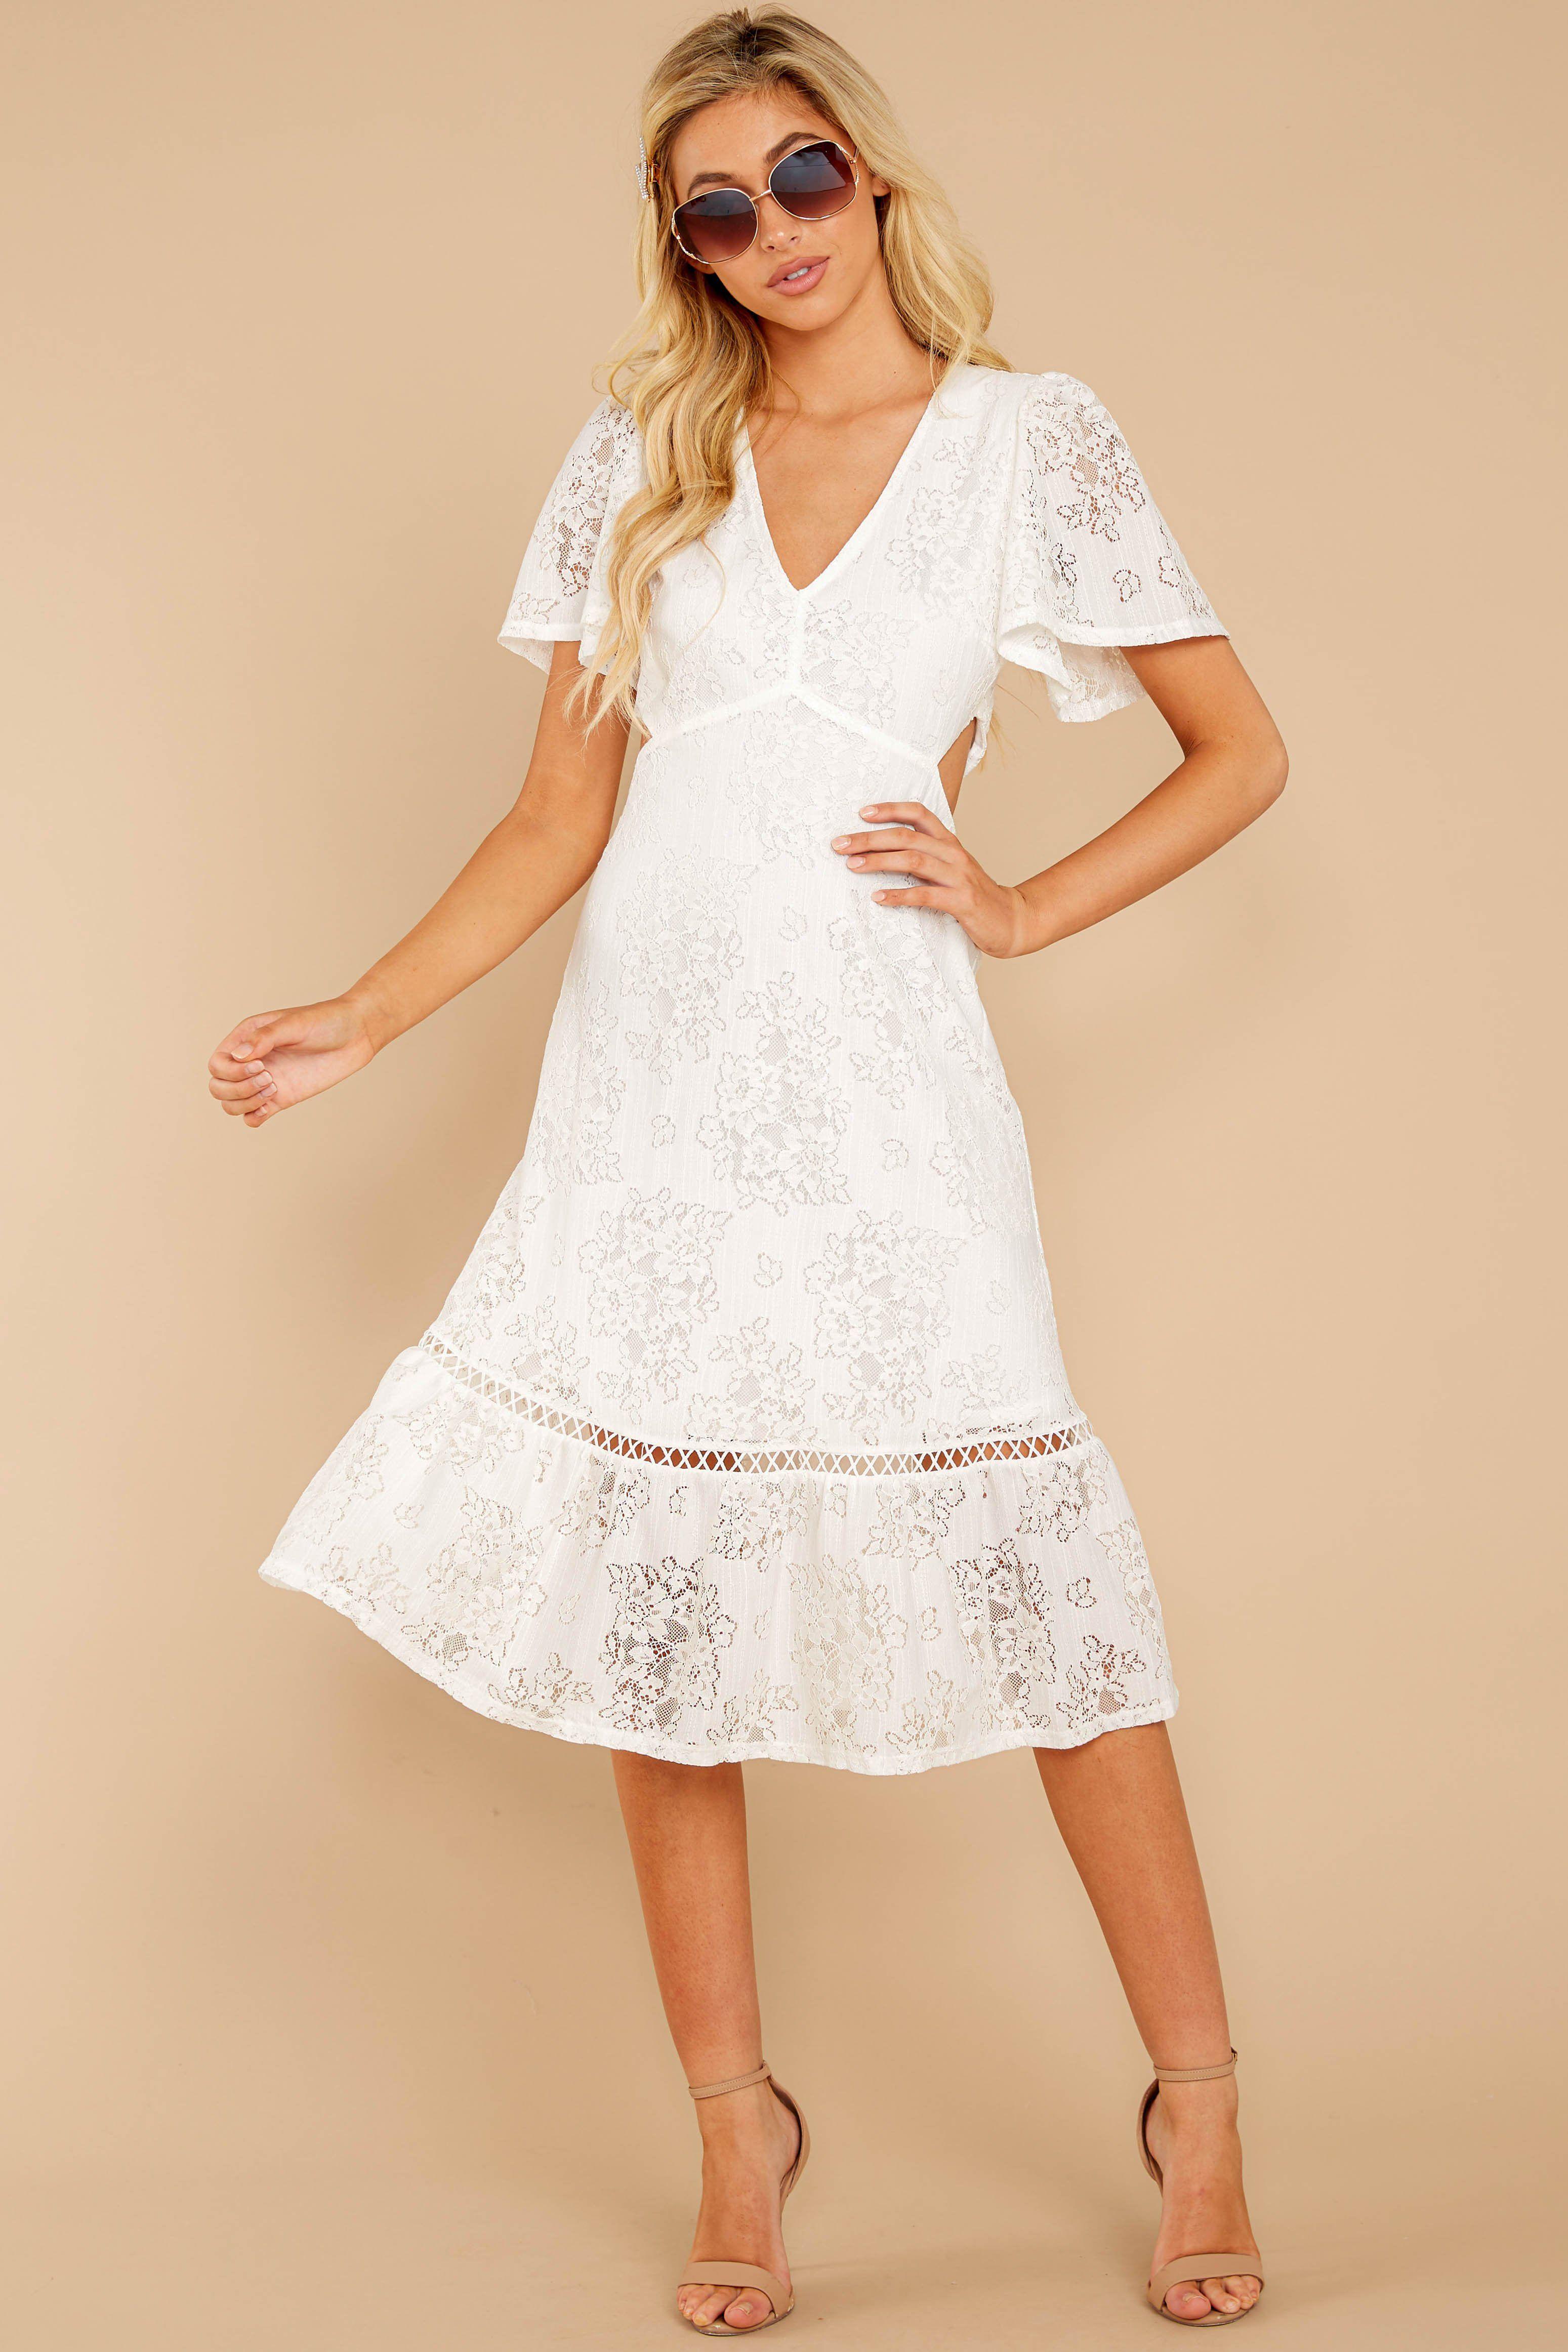 Charming White Lace Midi Short Sleeve Cutout Dress Dress 54 00 Red Dress White Lace Midi Dress Lace Midi Dress White Maxi Dresses [ 4647 x 3098 Pixel ]